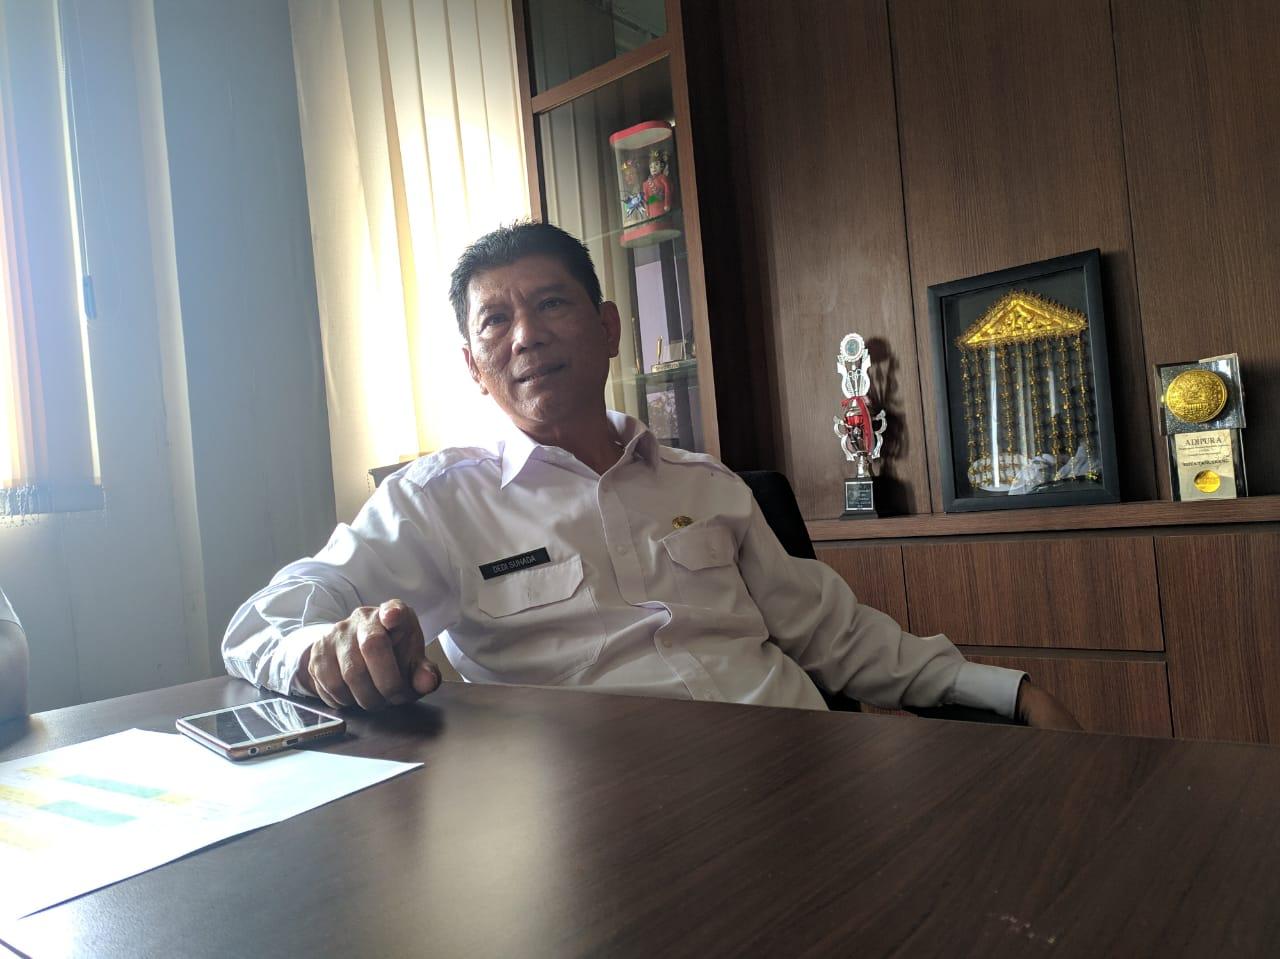 Kendaraan Umum Sumbang Polusi Terbesar di Kota Tangerang, DLH: Masih Relatif Aman